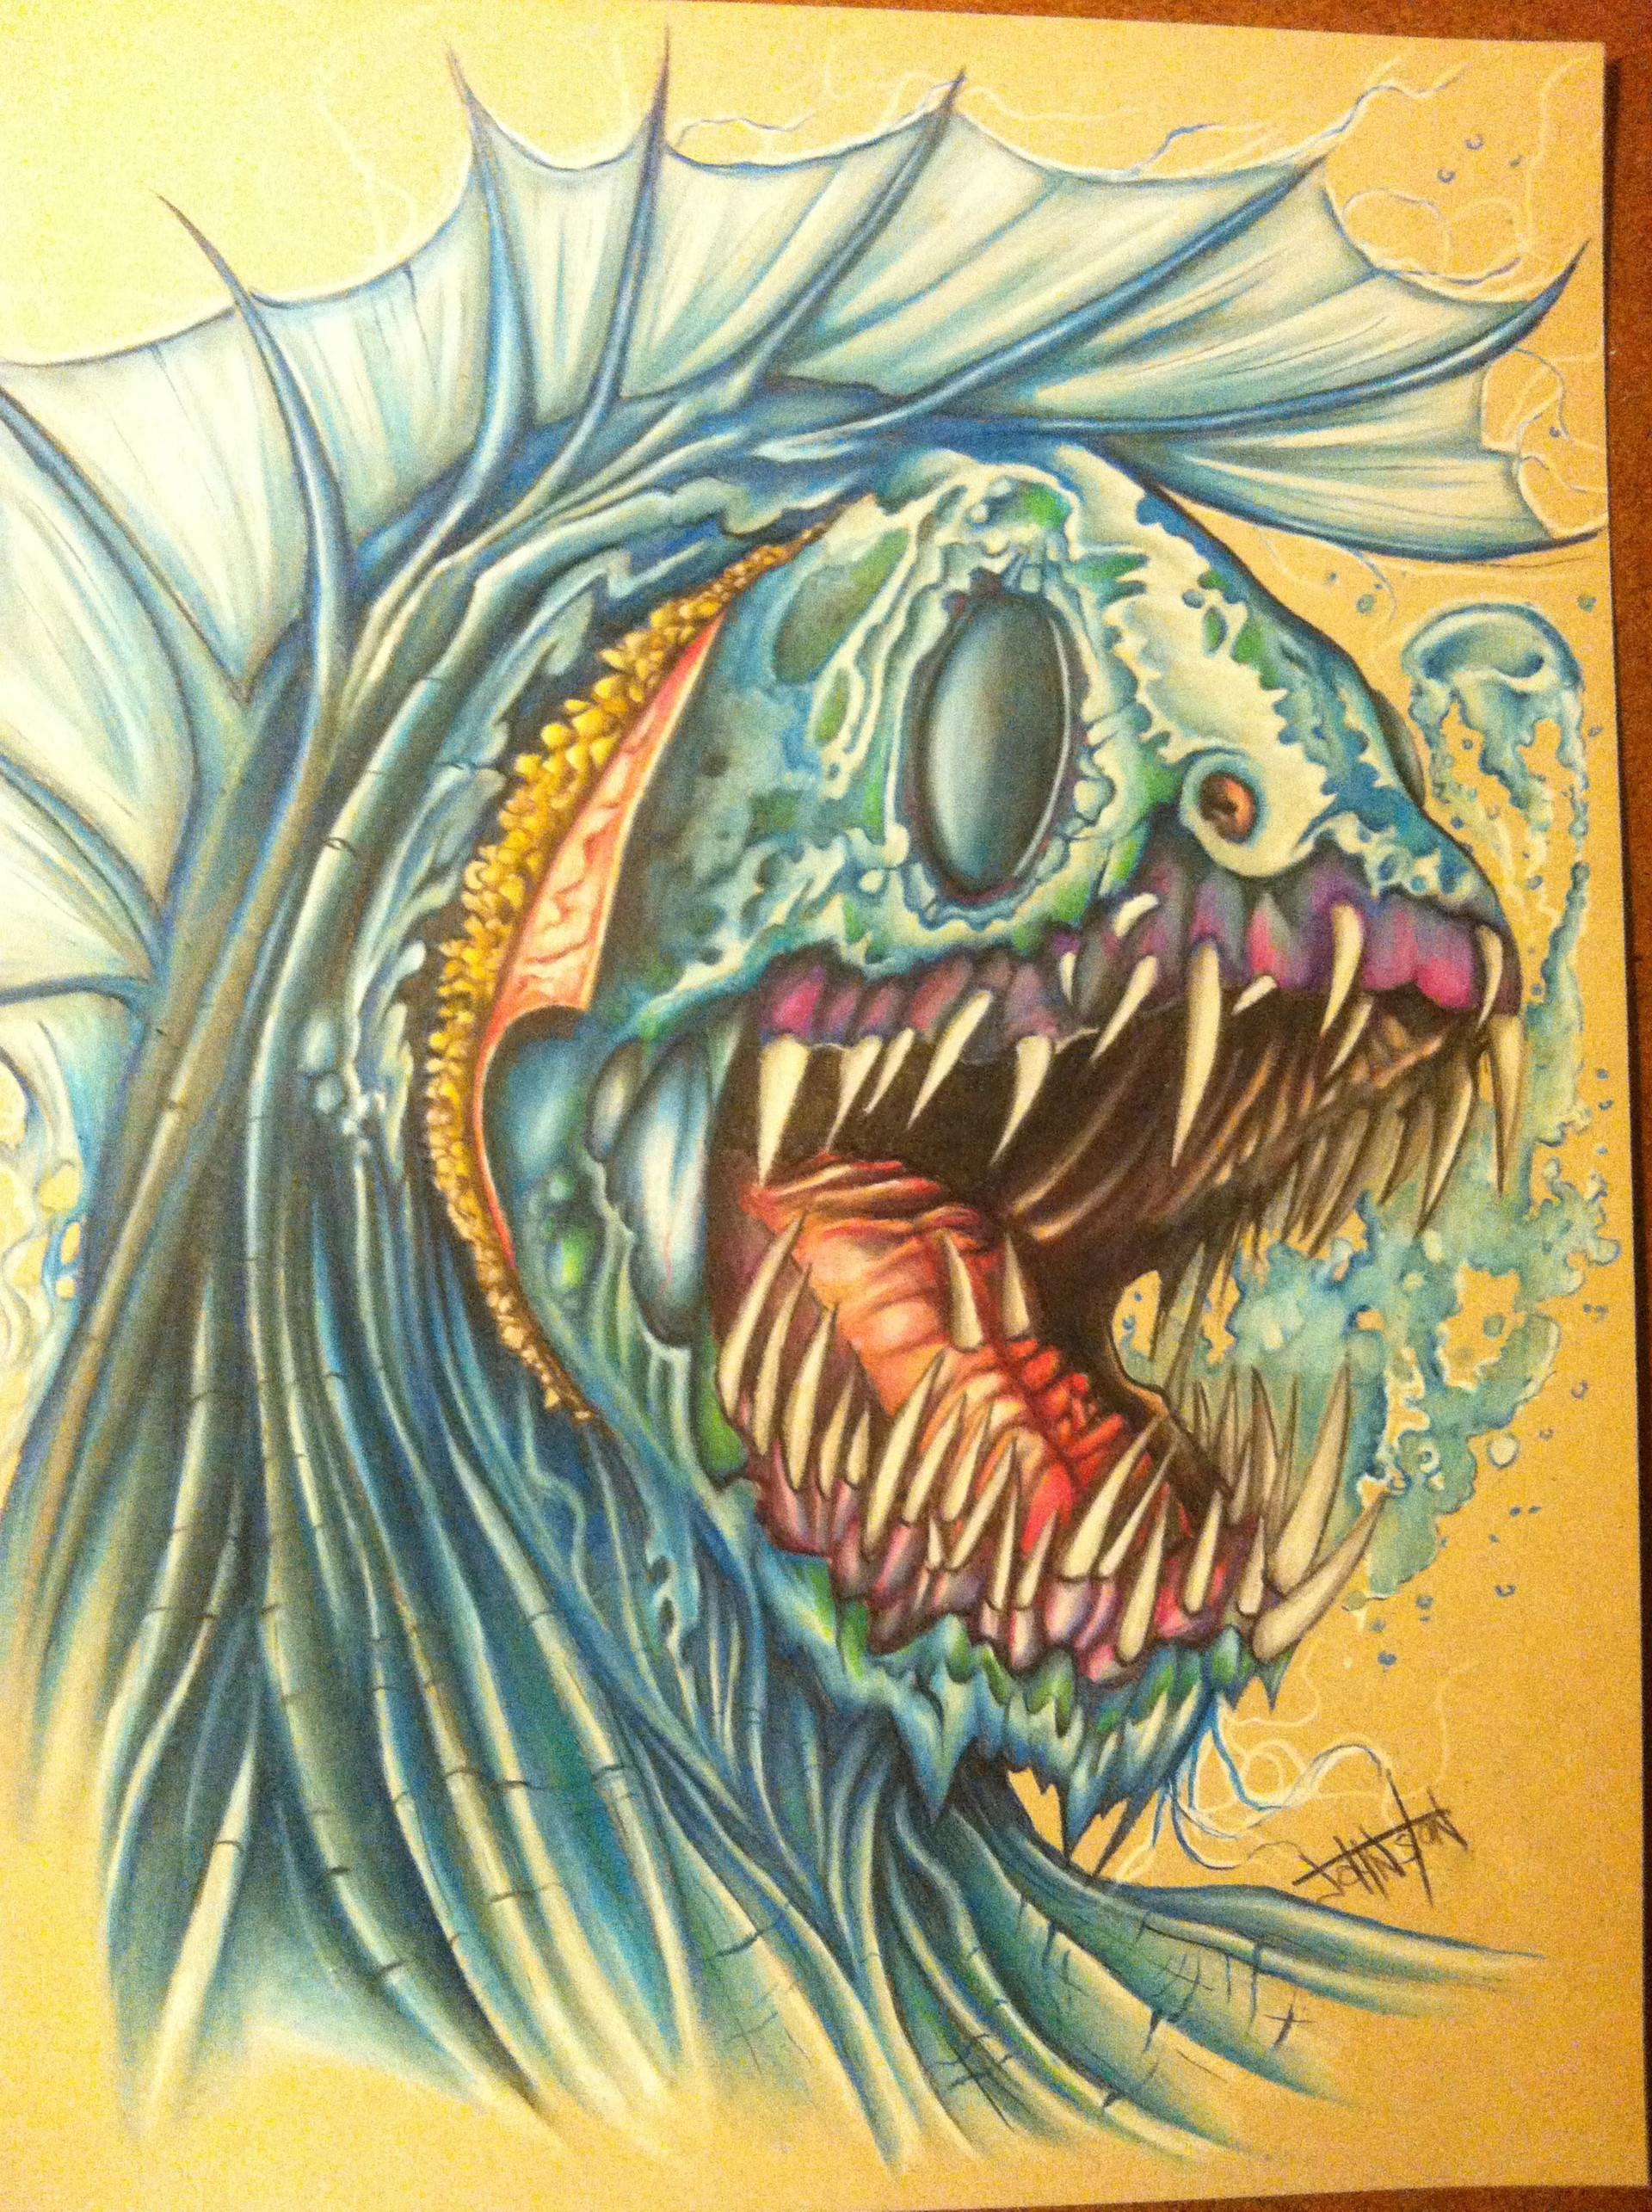 Mike johnston ruinedworld wip prismacolor03